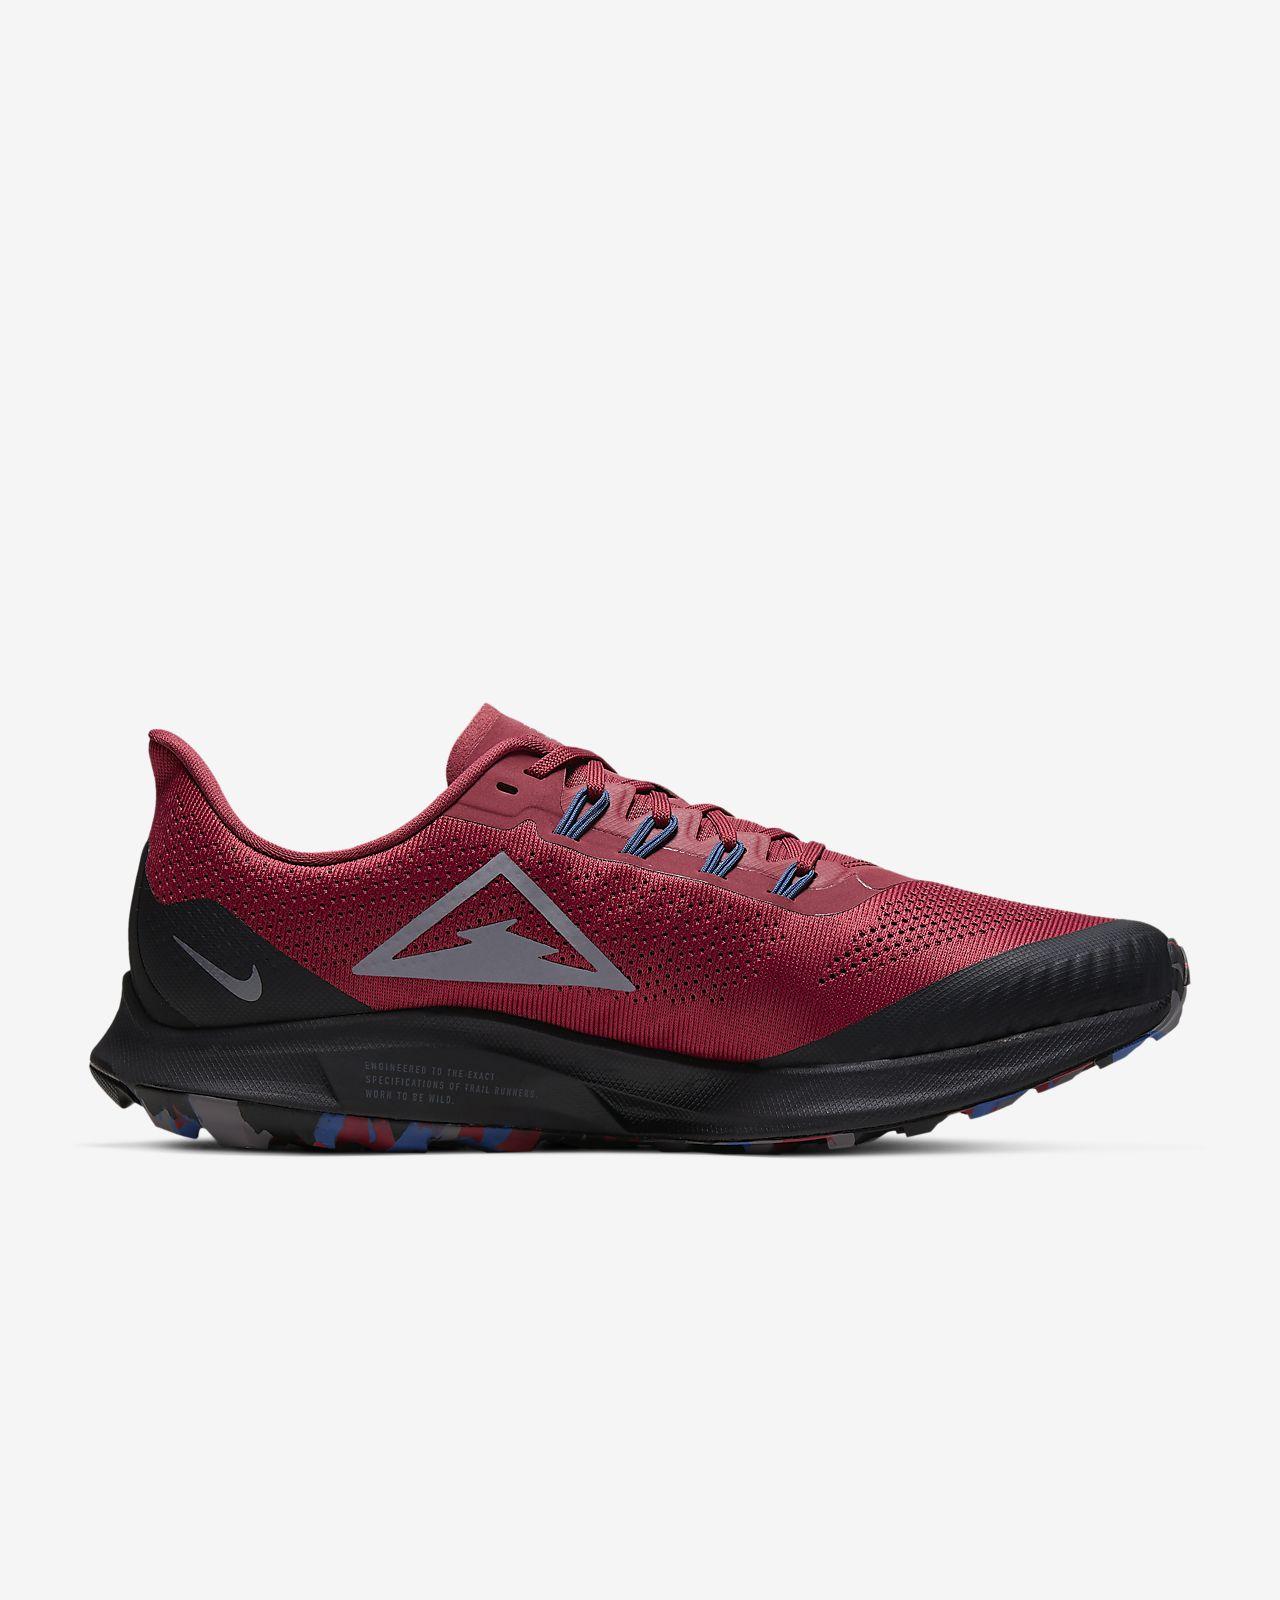 adidas chaussure chaussure adidas running running afrique UVMzpqS